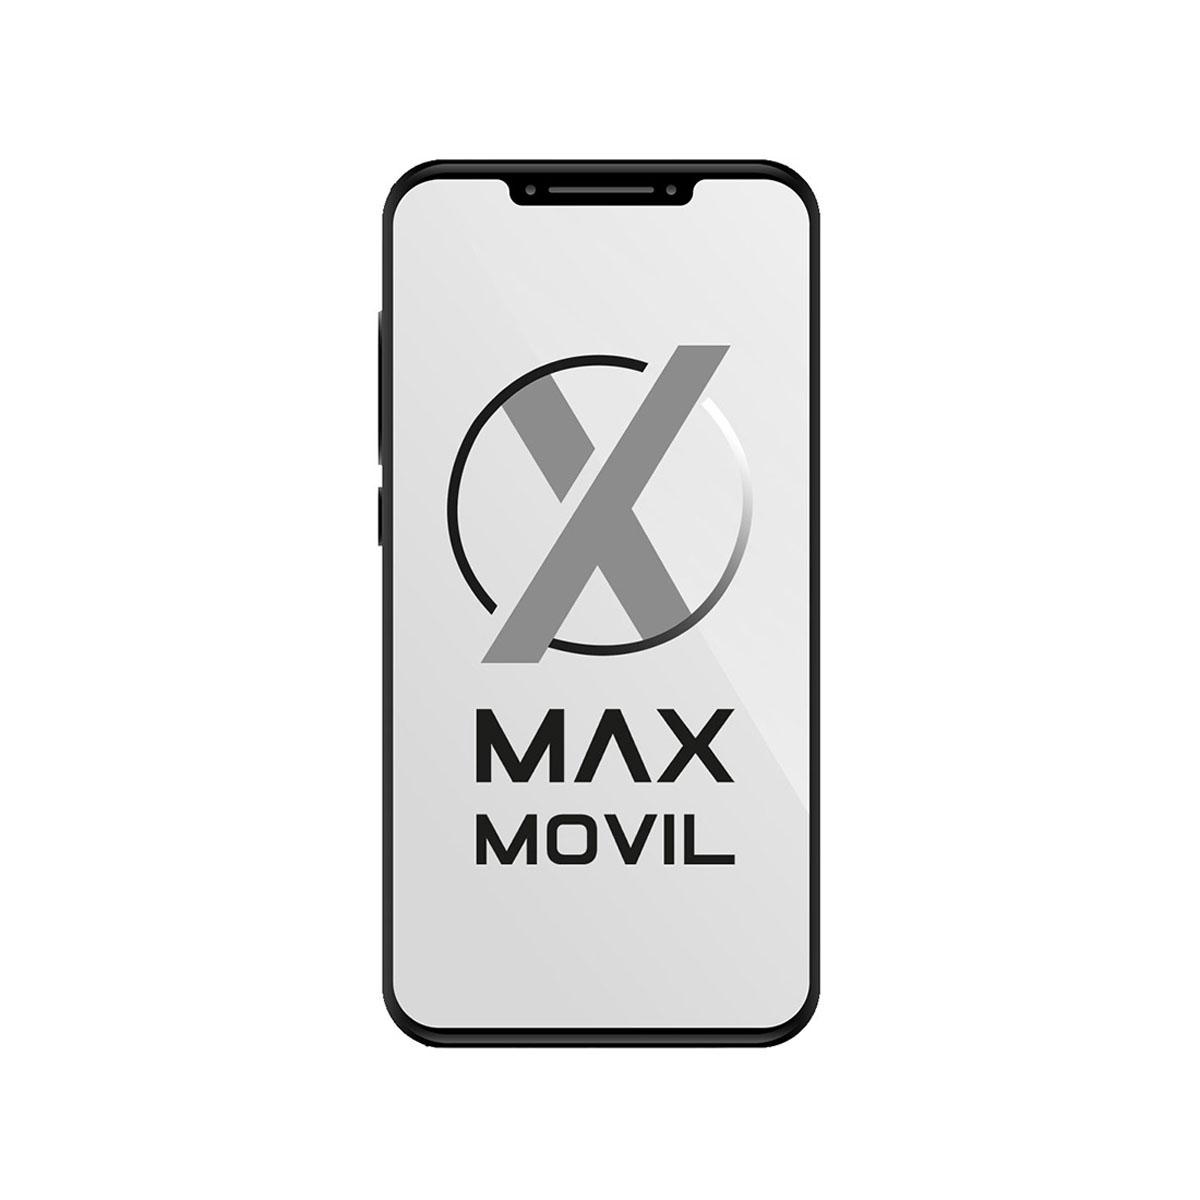 Huawei P8 titanium grey libre en MAXmovil